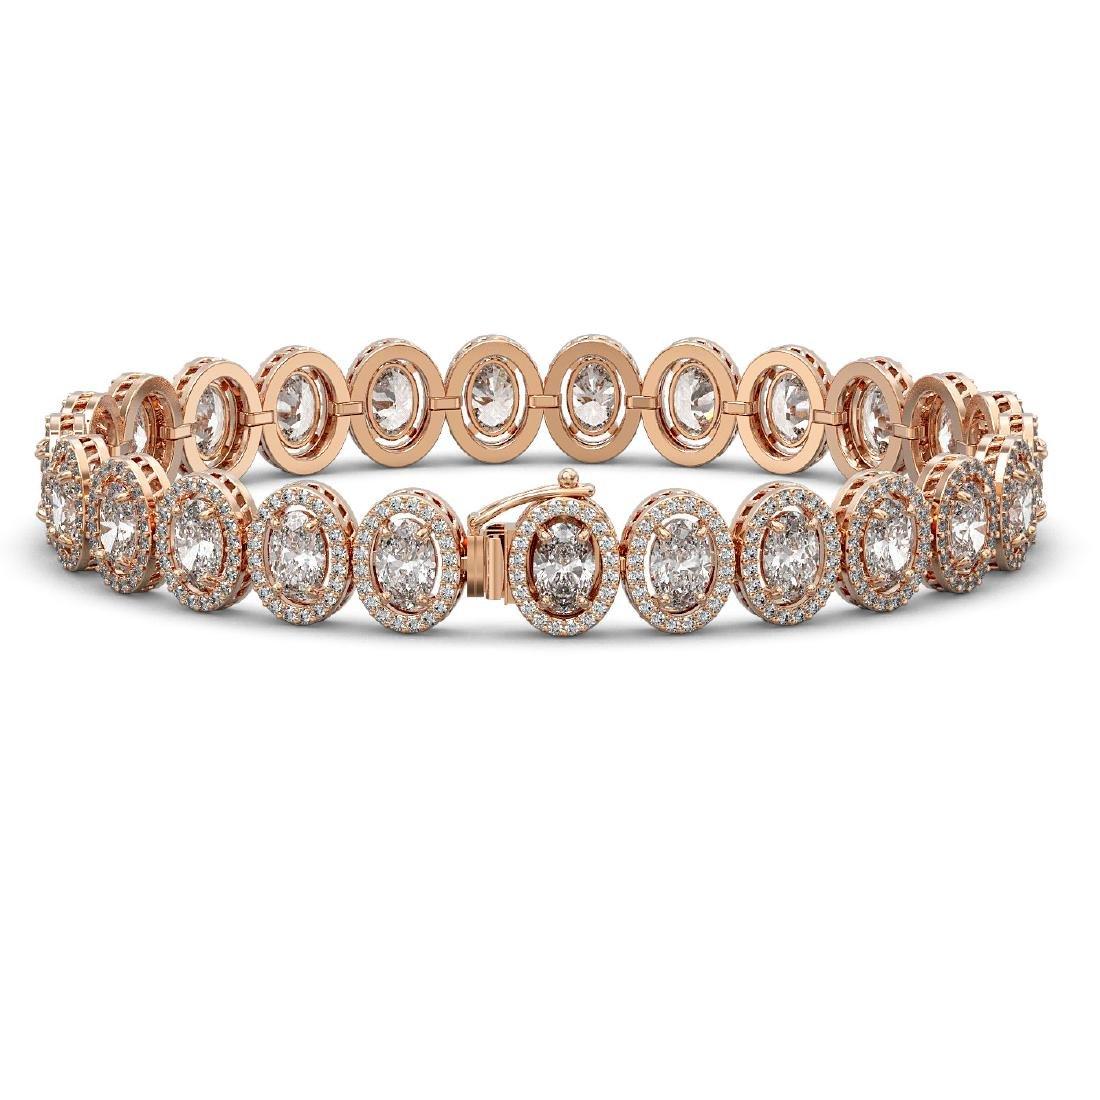 18.8 CTW Oval Diamond Designer Bracelet 18K Rose Gold - 2